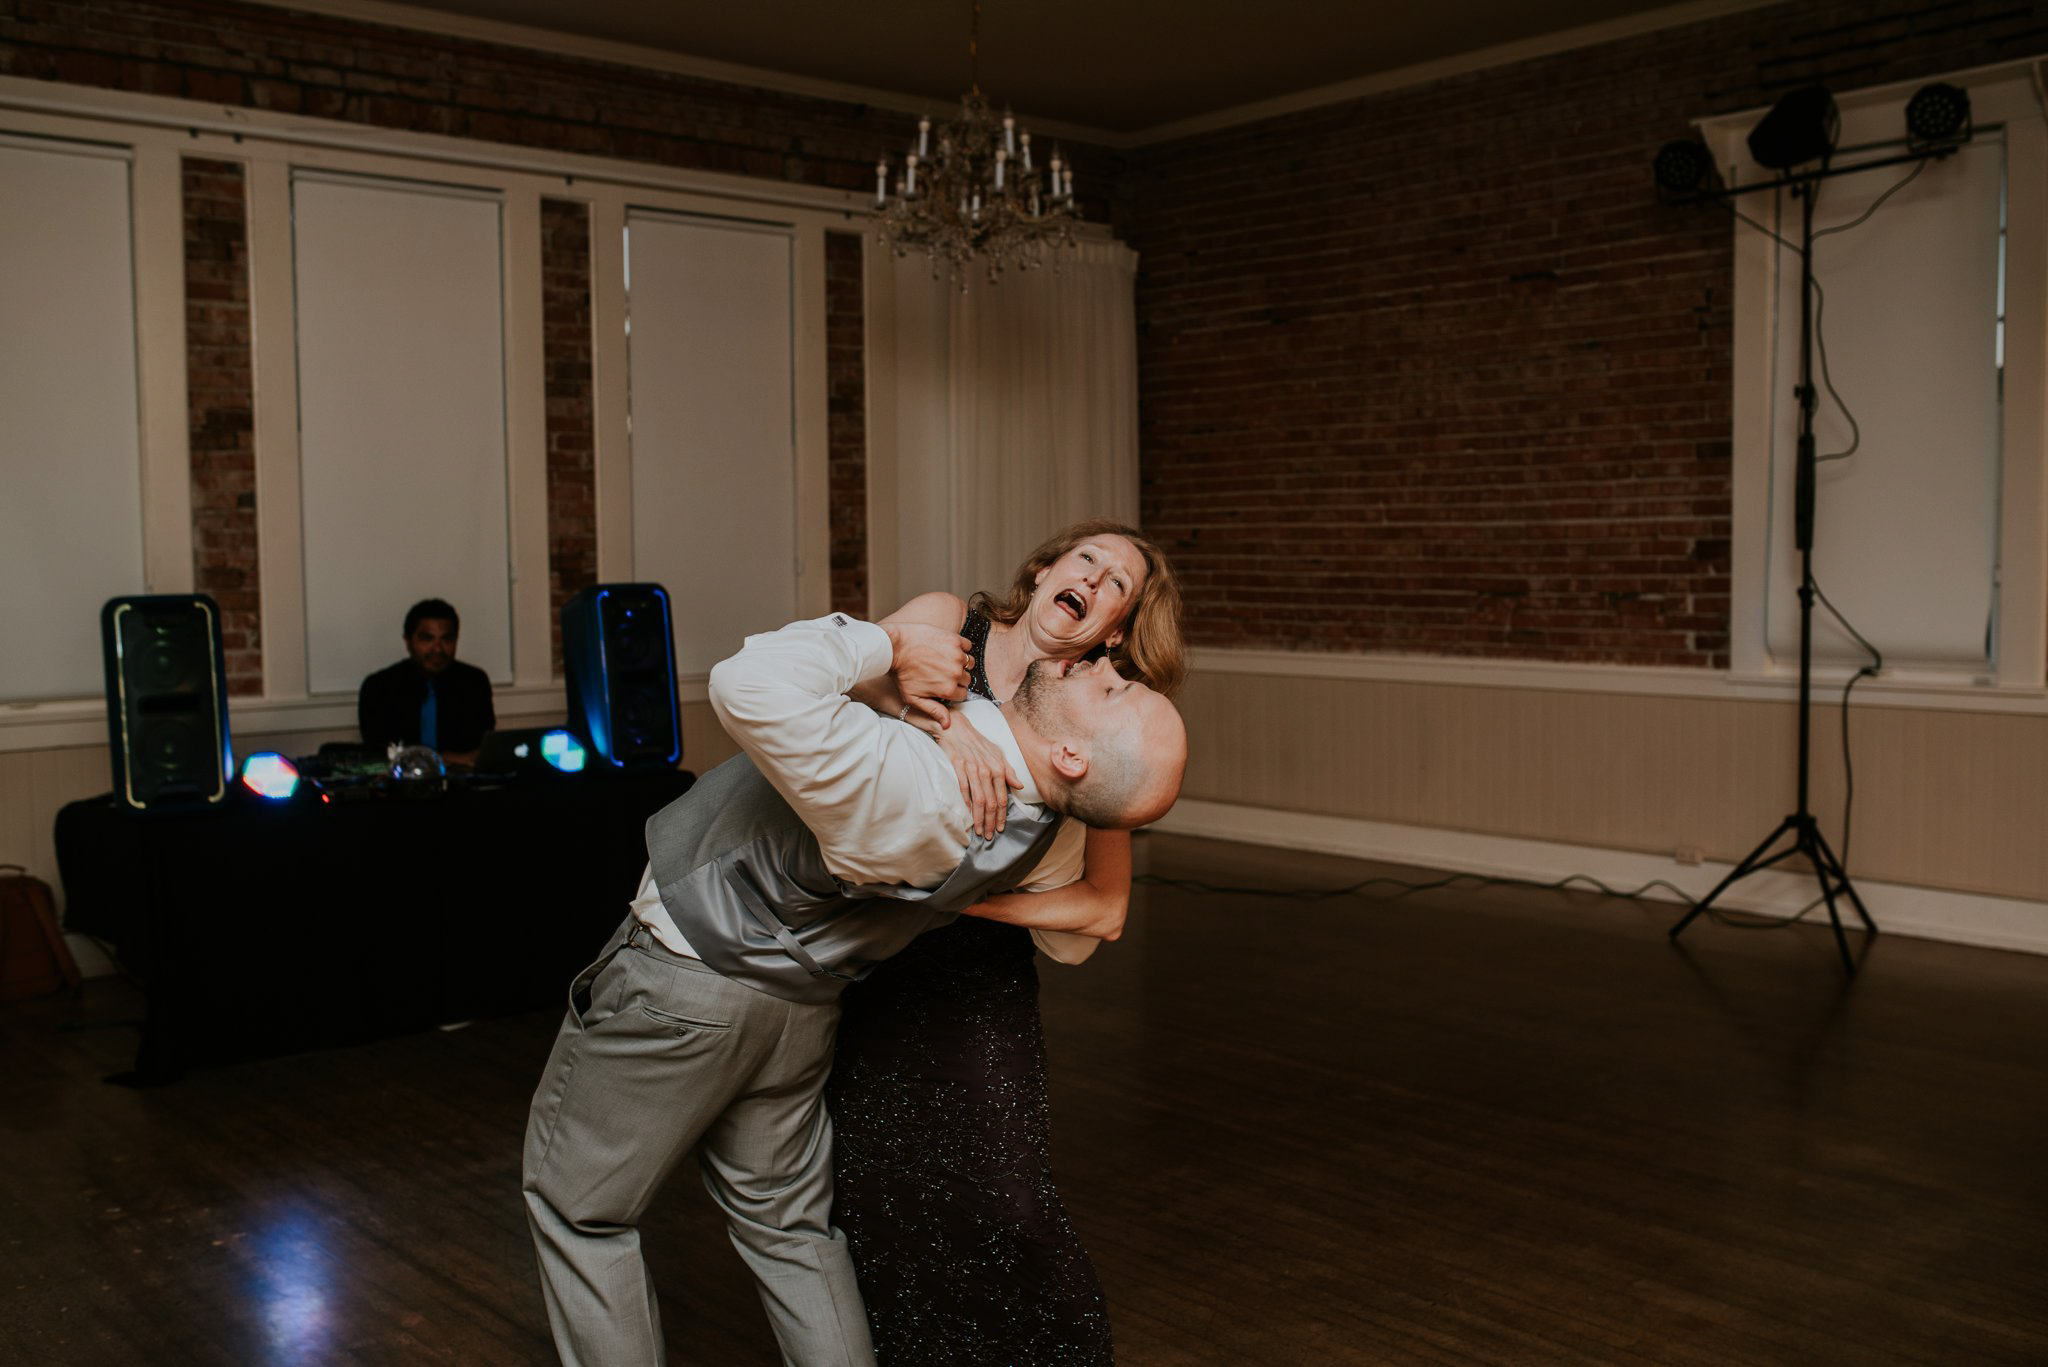 hollywood-school-house-wedding-seattle-photographer-caitlyn-nikula-117.jpg